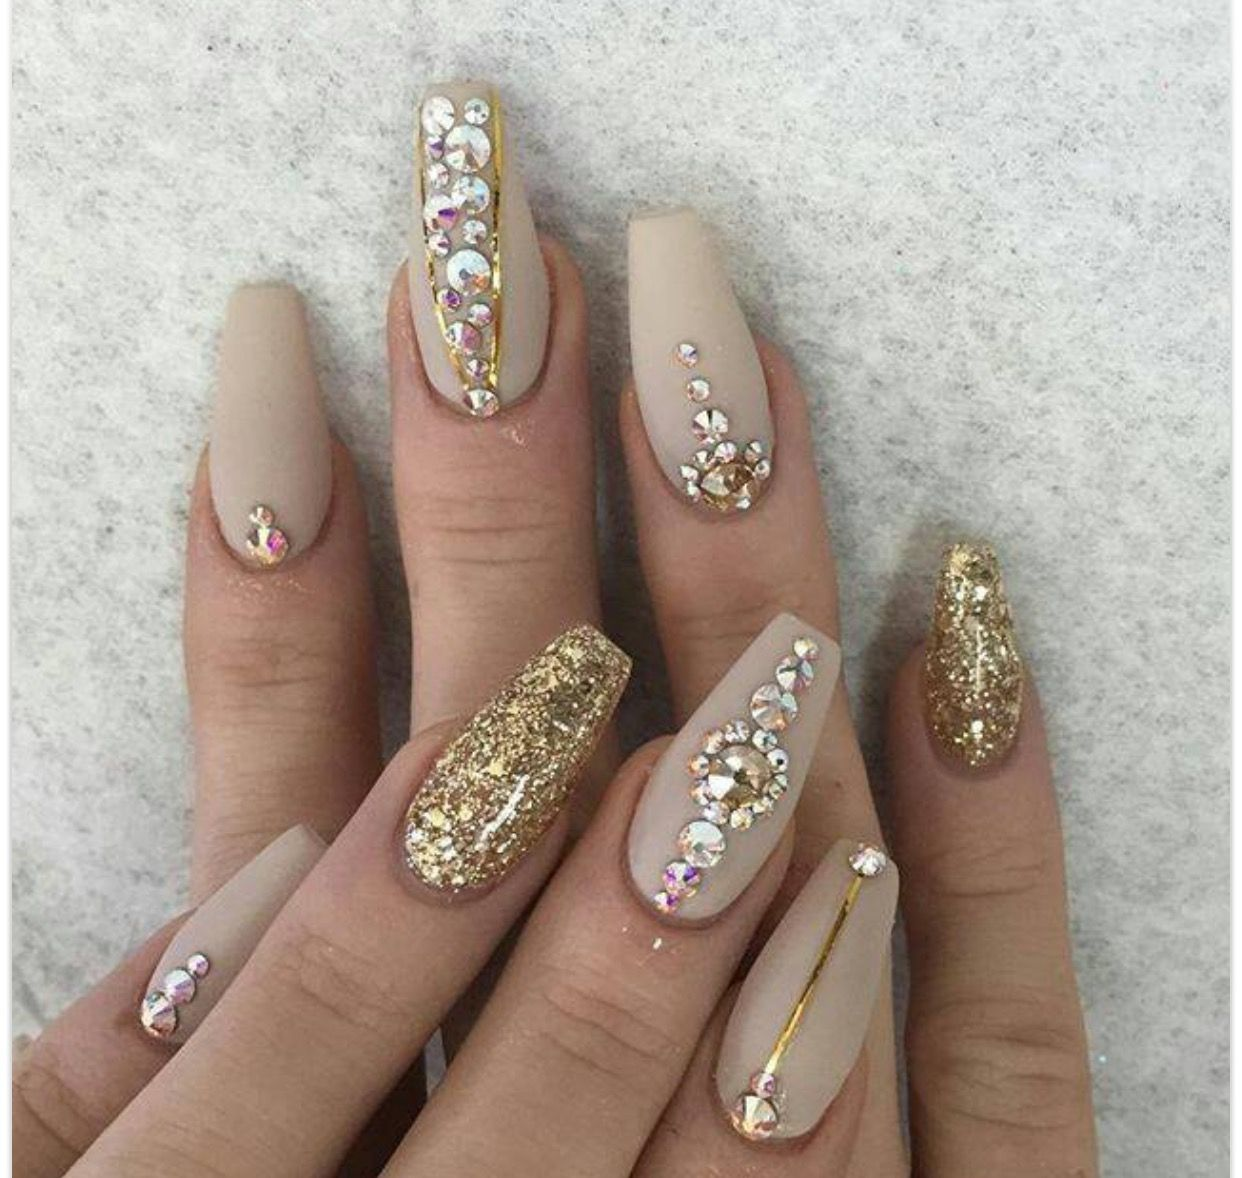 Pin von Alexa Carolina auf Nails | Pinterest | Fingernägel